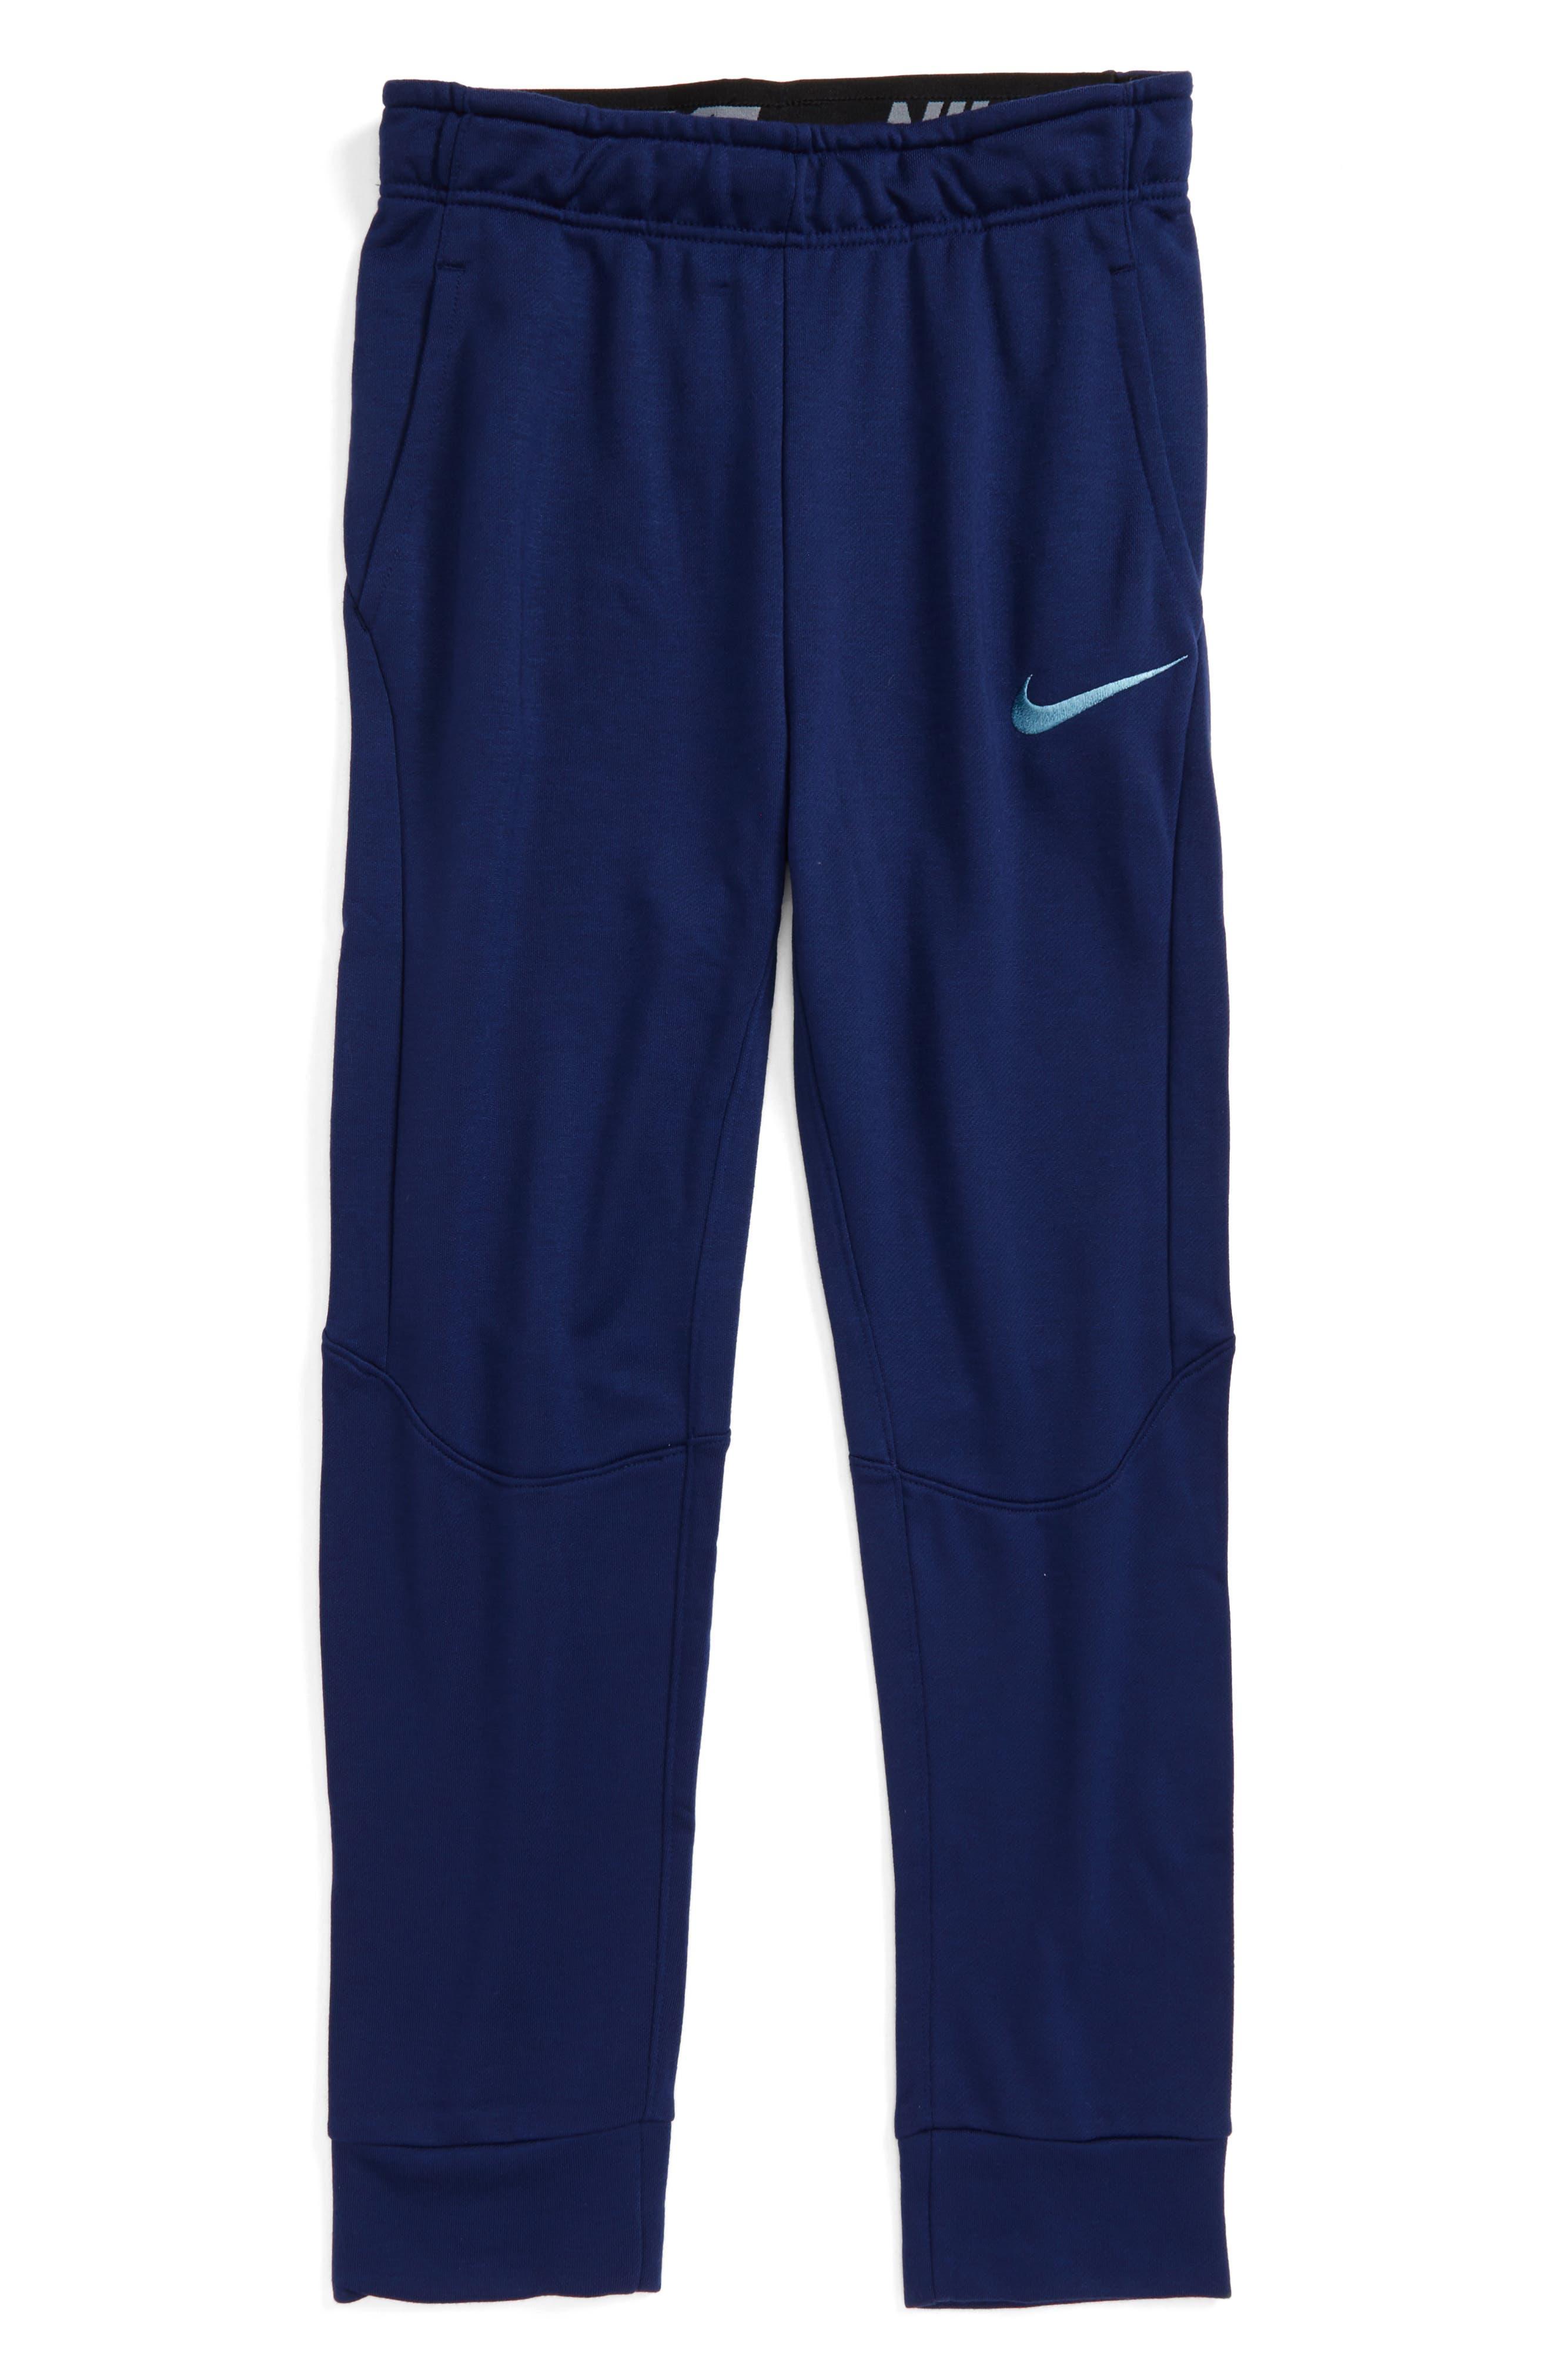 Alternate Image 1 Selected - Nike Dry Fleece Training Pants (Little Boys & Big Boys)